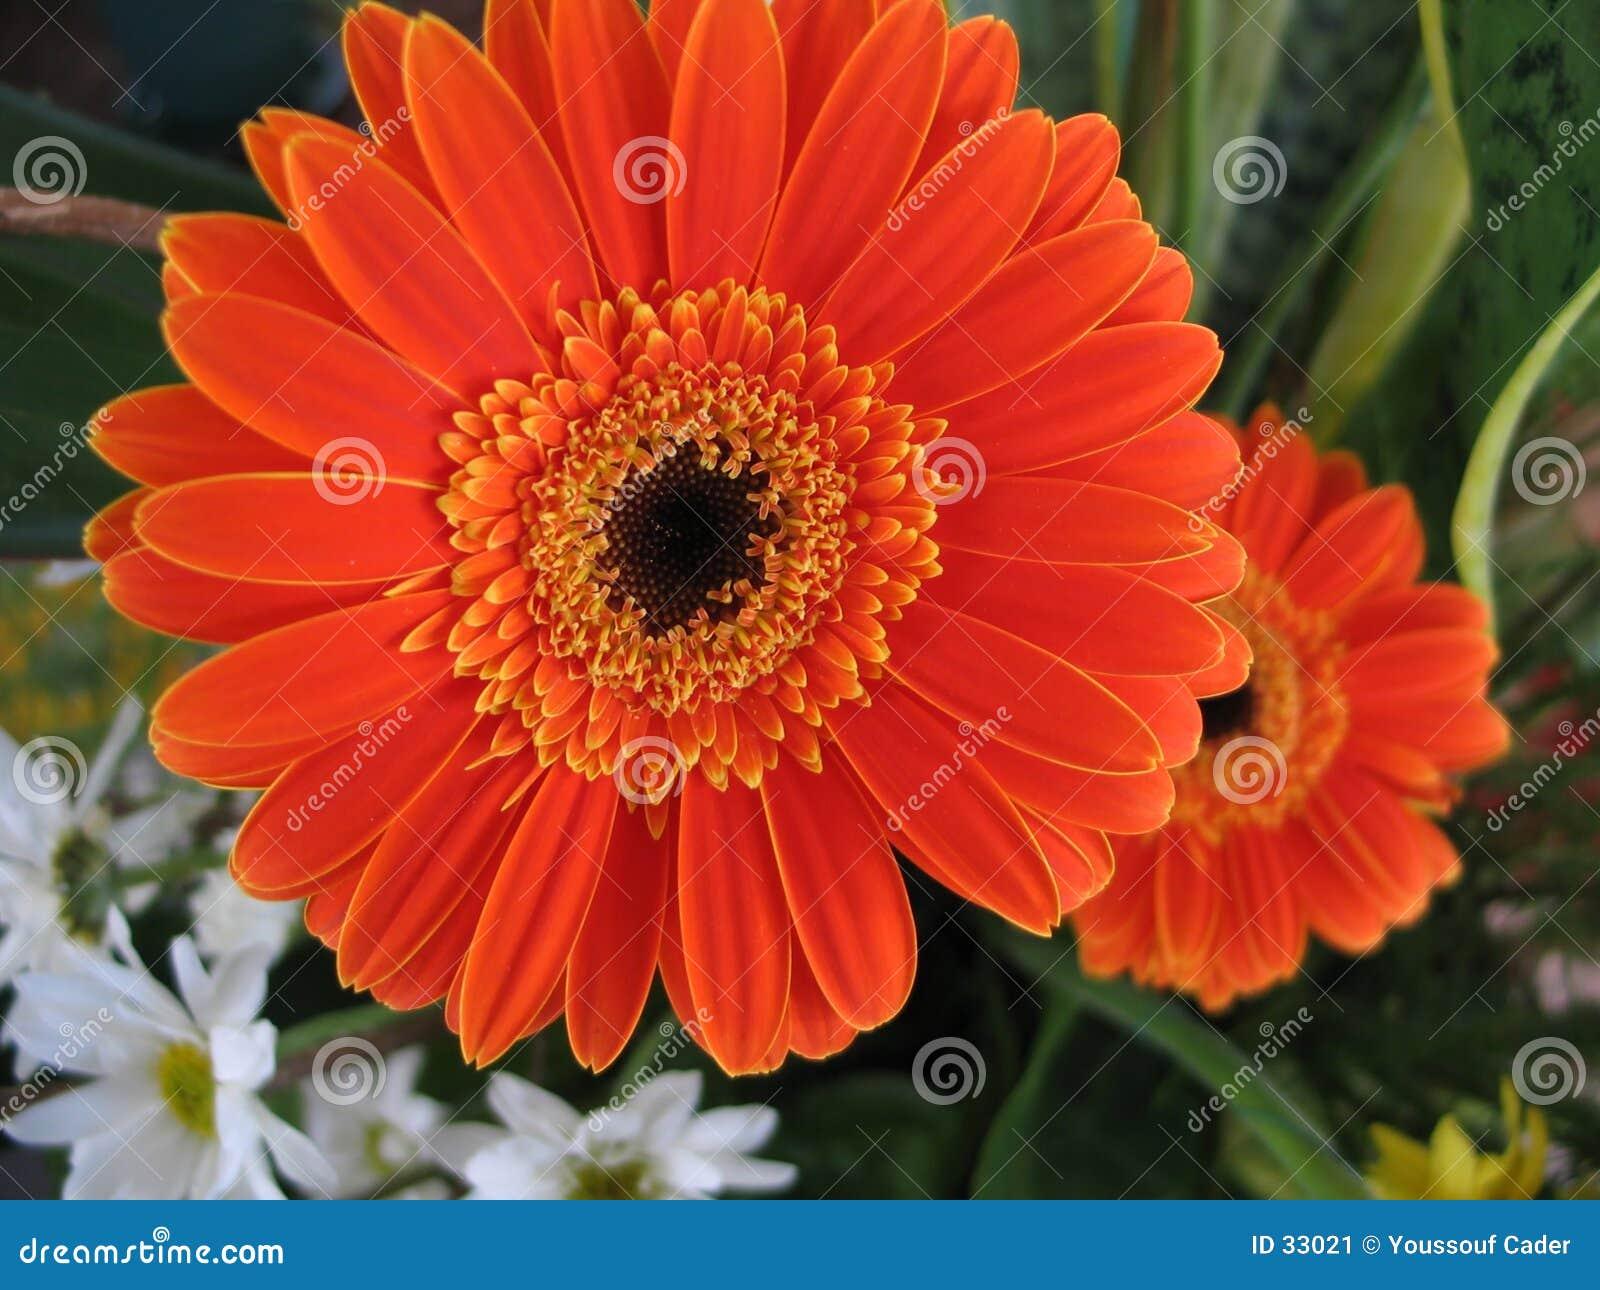 Download Margaritas imagen de archivo. Imagen de margarita, botánico - 33021